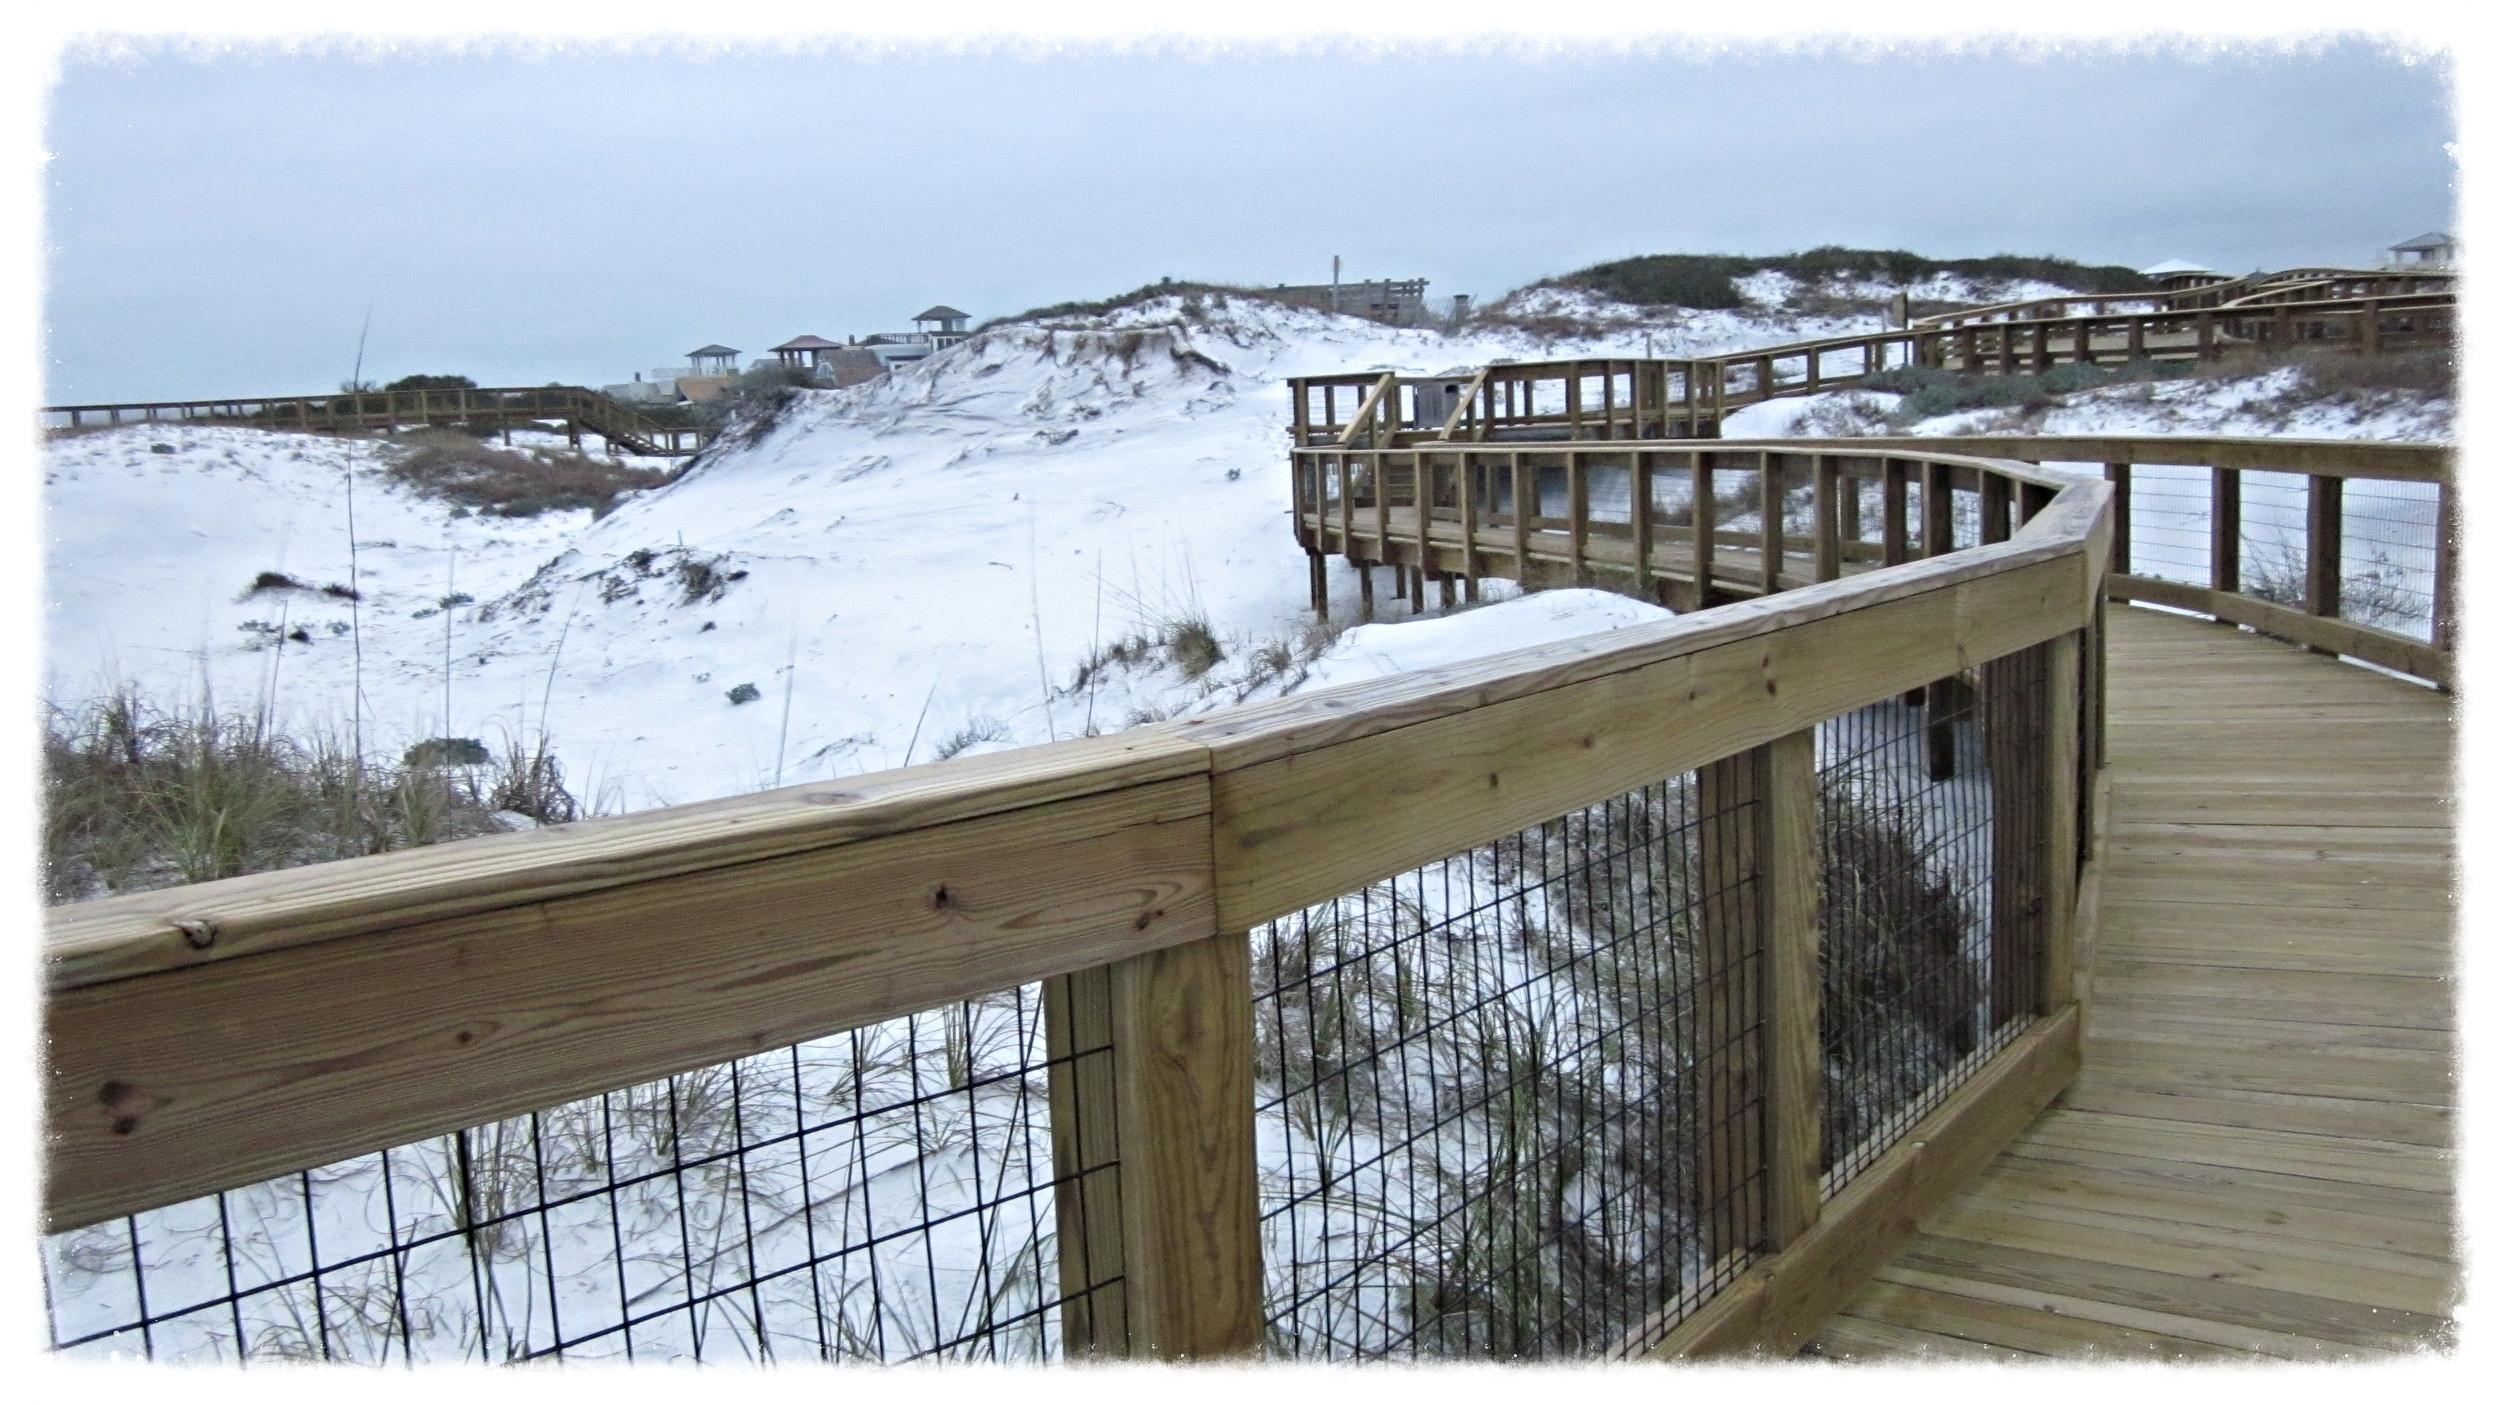 Wooden Beach Boardwalk Design and Construction